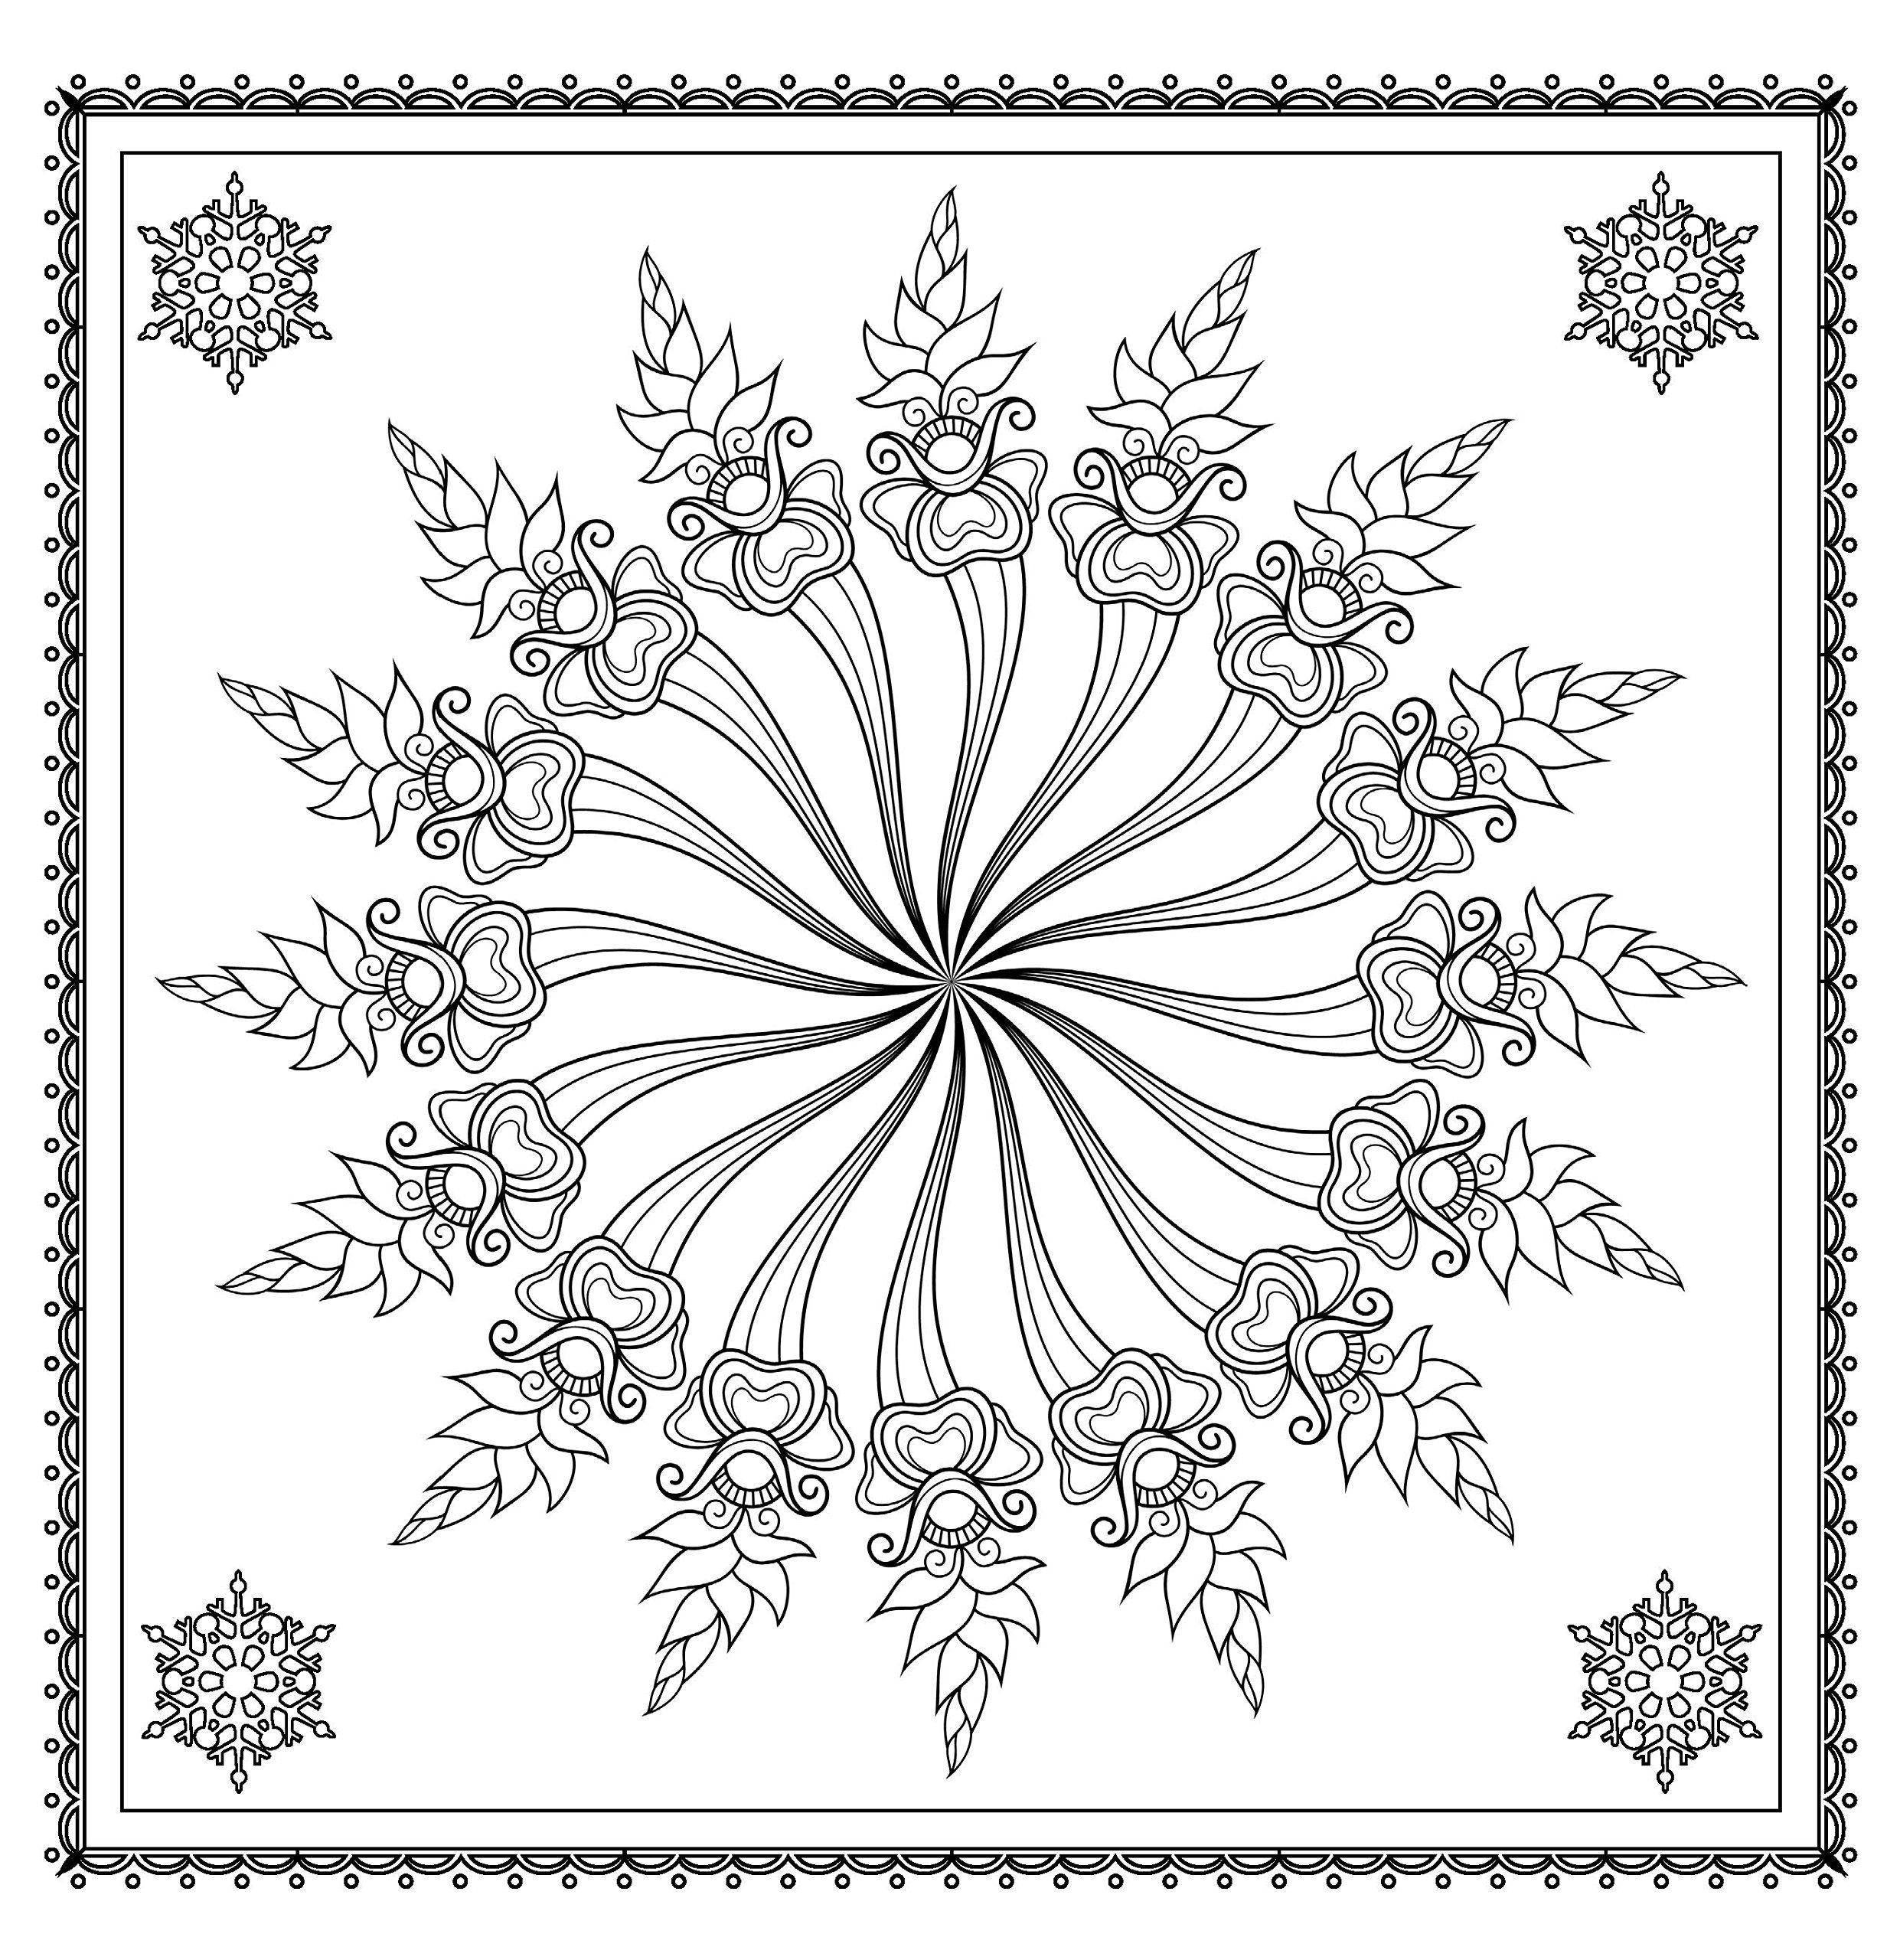 Amazon.com: Christmas Magic: Fabulous Festive Designs to Color ...